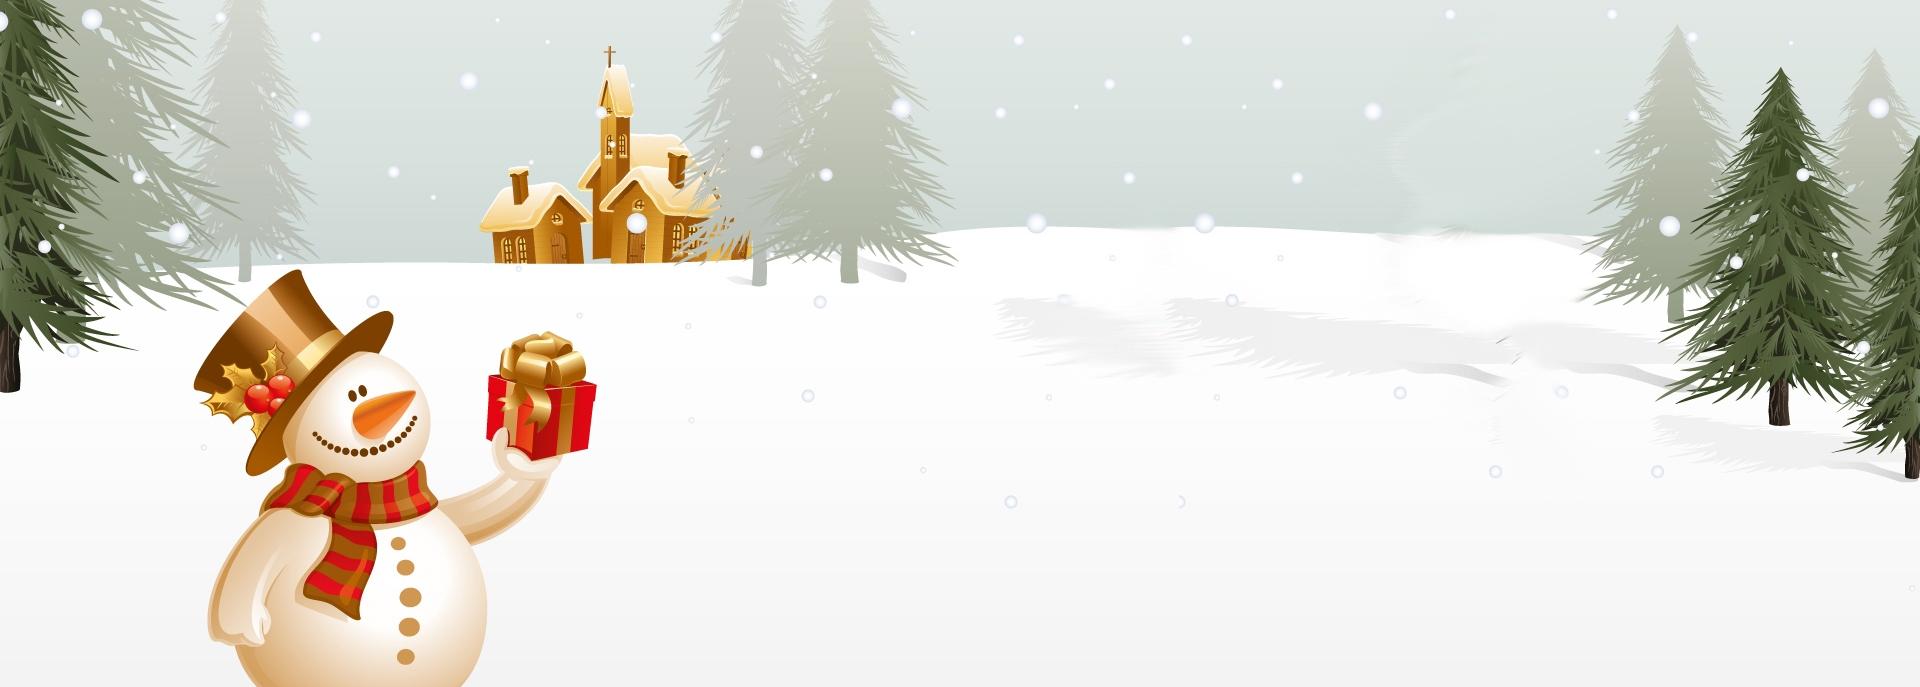 2015-Christmas-Background-3.jpg